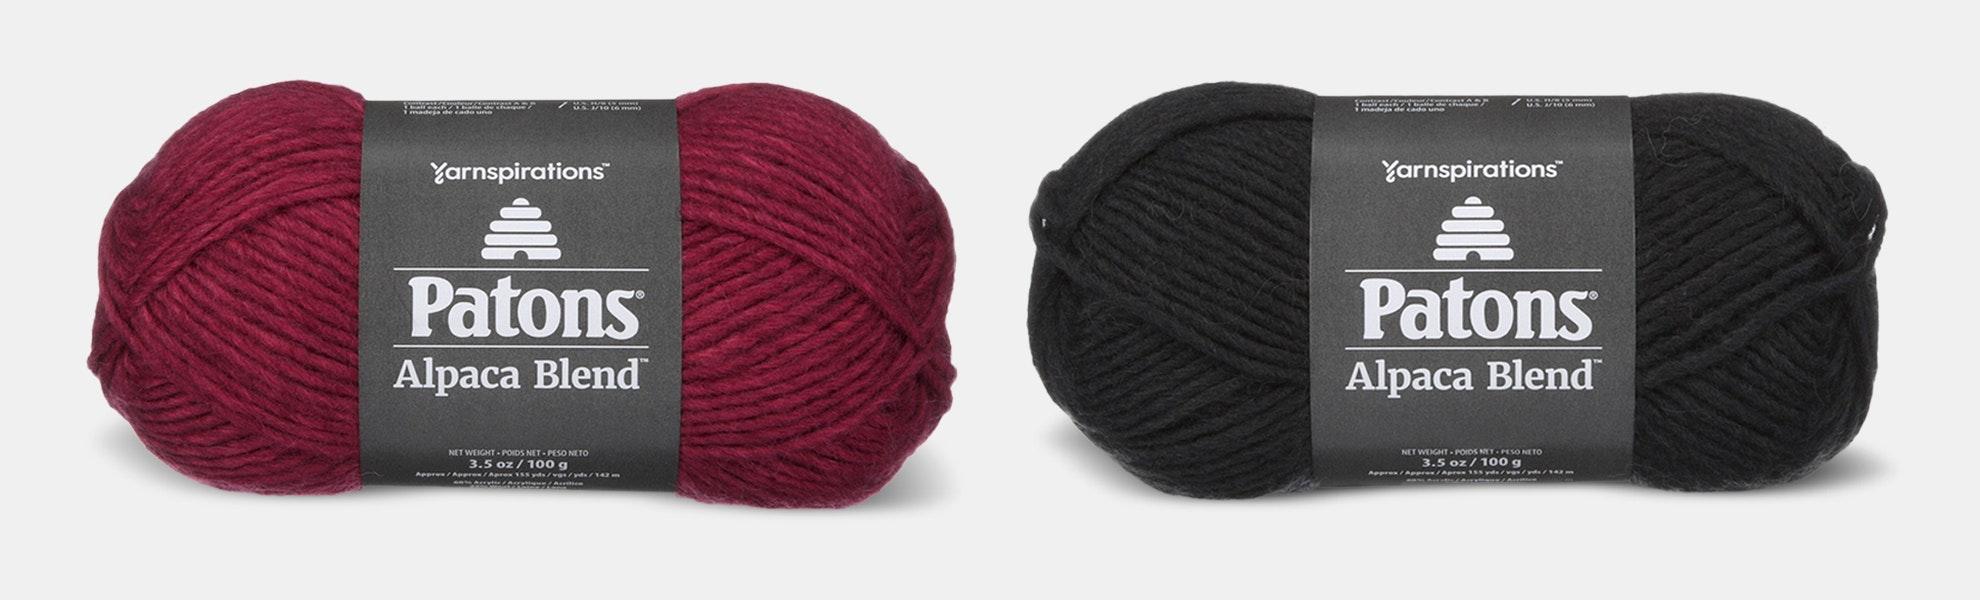 Alpaca Blend Yarn by Patons (2-Pack)